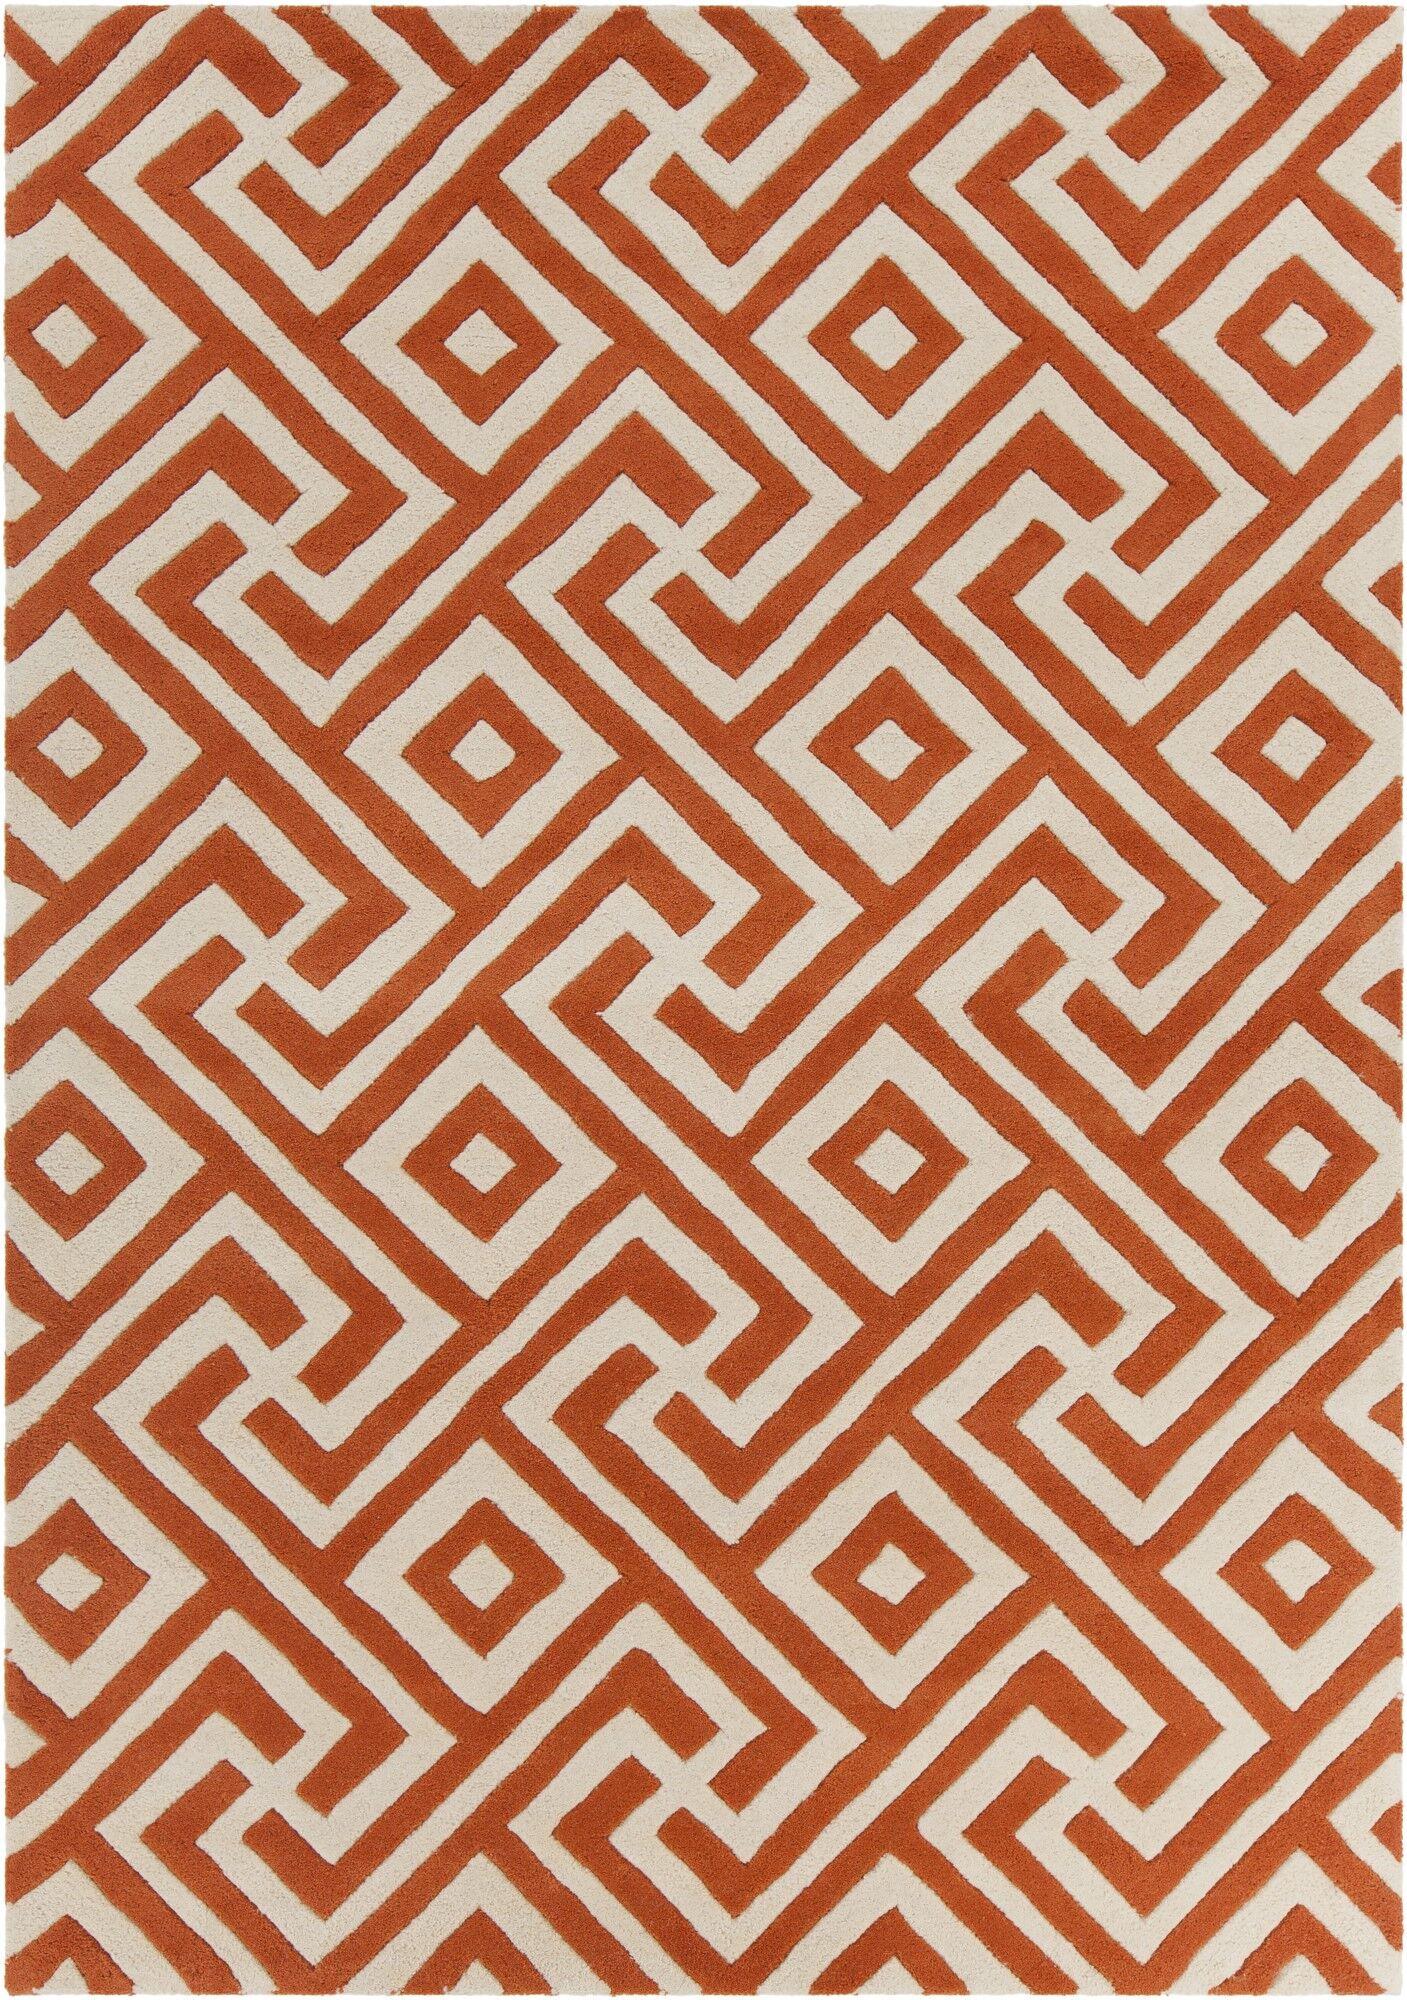 Electra Hand Tufted Rectangle Contemporary Orange/Cream Area Rug Rug Size: 5' x 7'